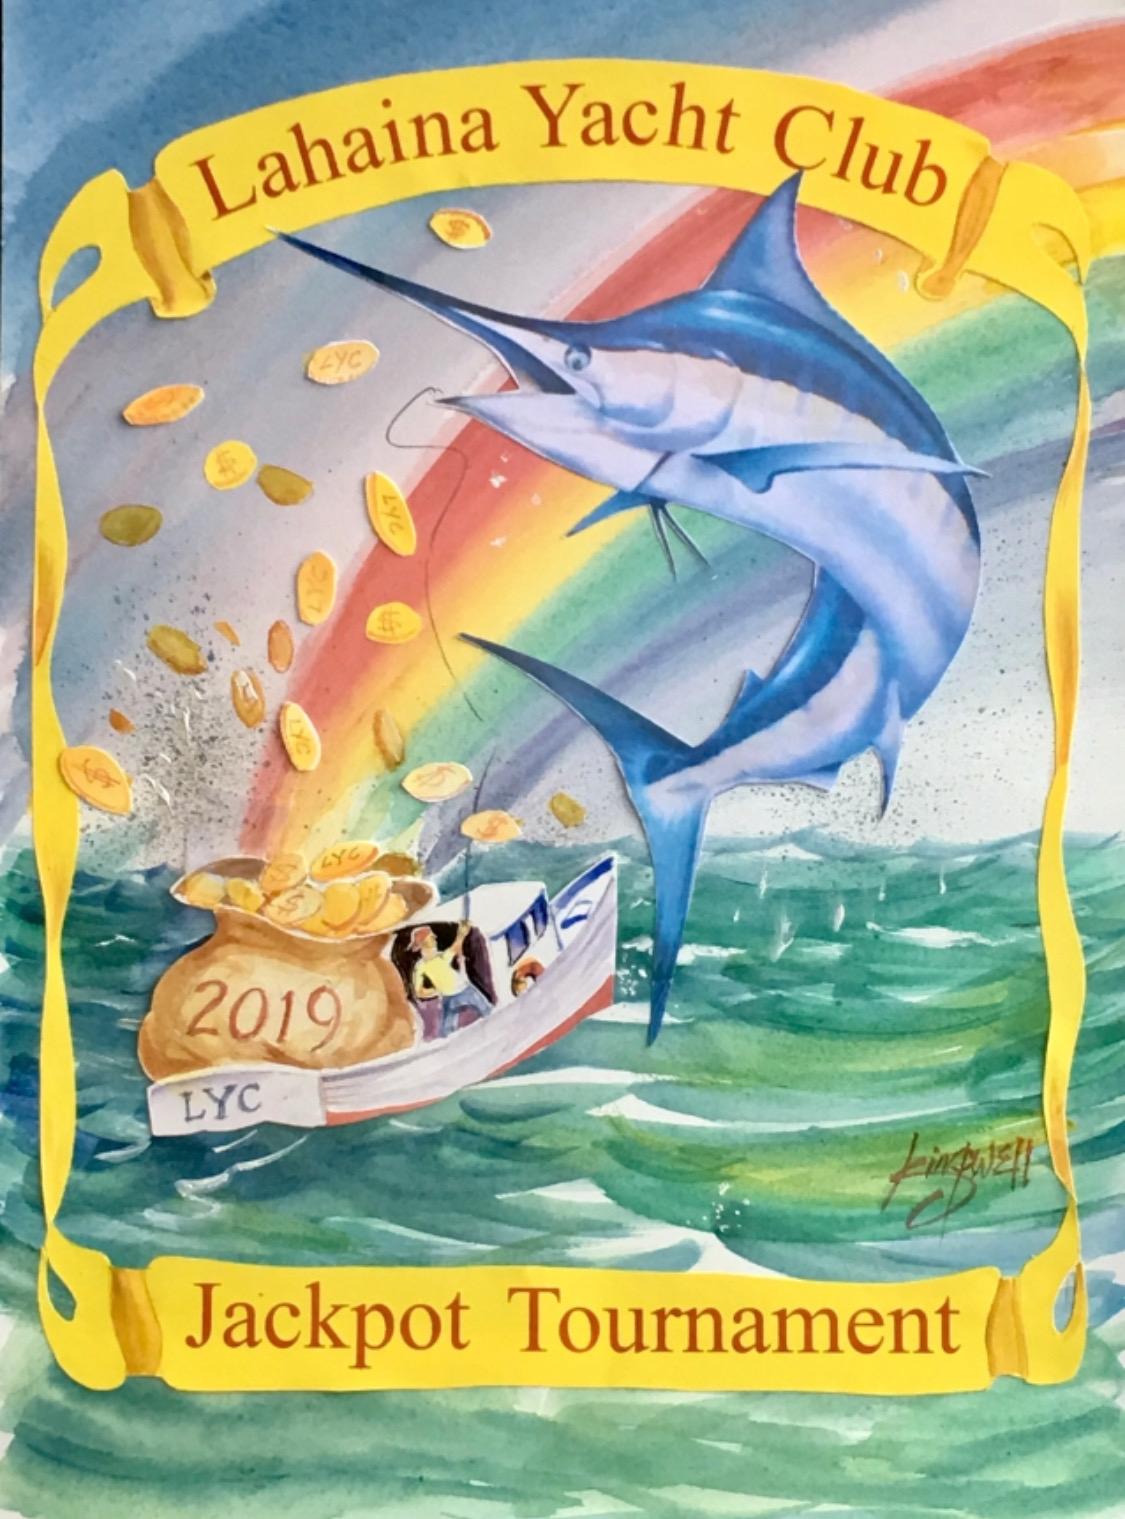 Halloween Fishing Torument 2020 Lahaina Nov.3 2019 JACKPOT TOURNAMENT NOVEMBER 2ND! — Lahaina Yacht Club